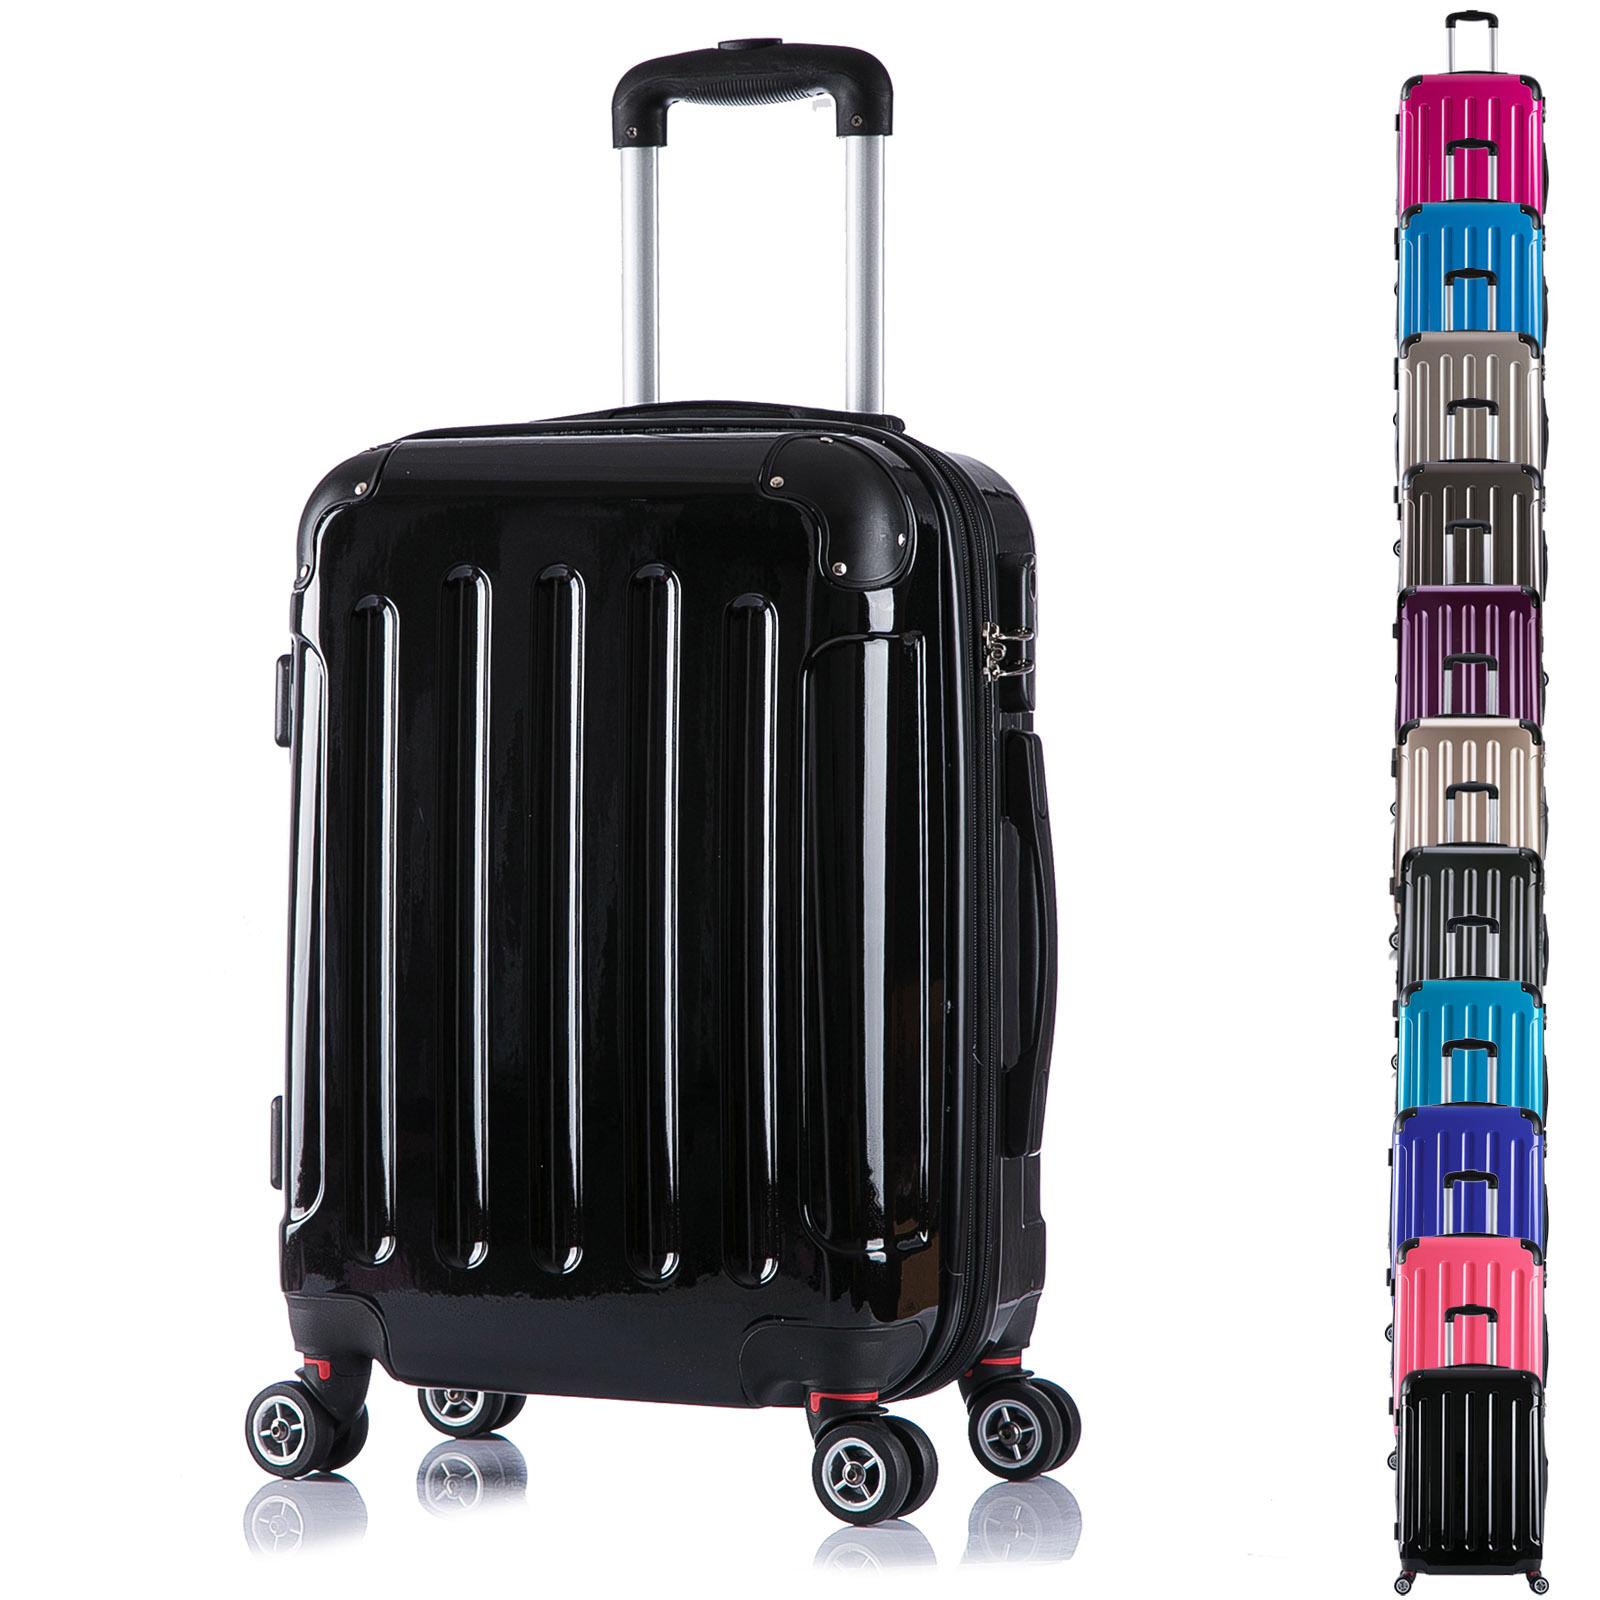 valise cabine rigide bagage de voyage avec 4 roulettes. Black Bedroom Furniture Sets. Home Design Ideas